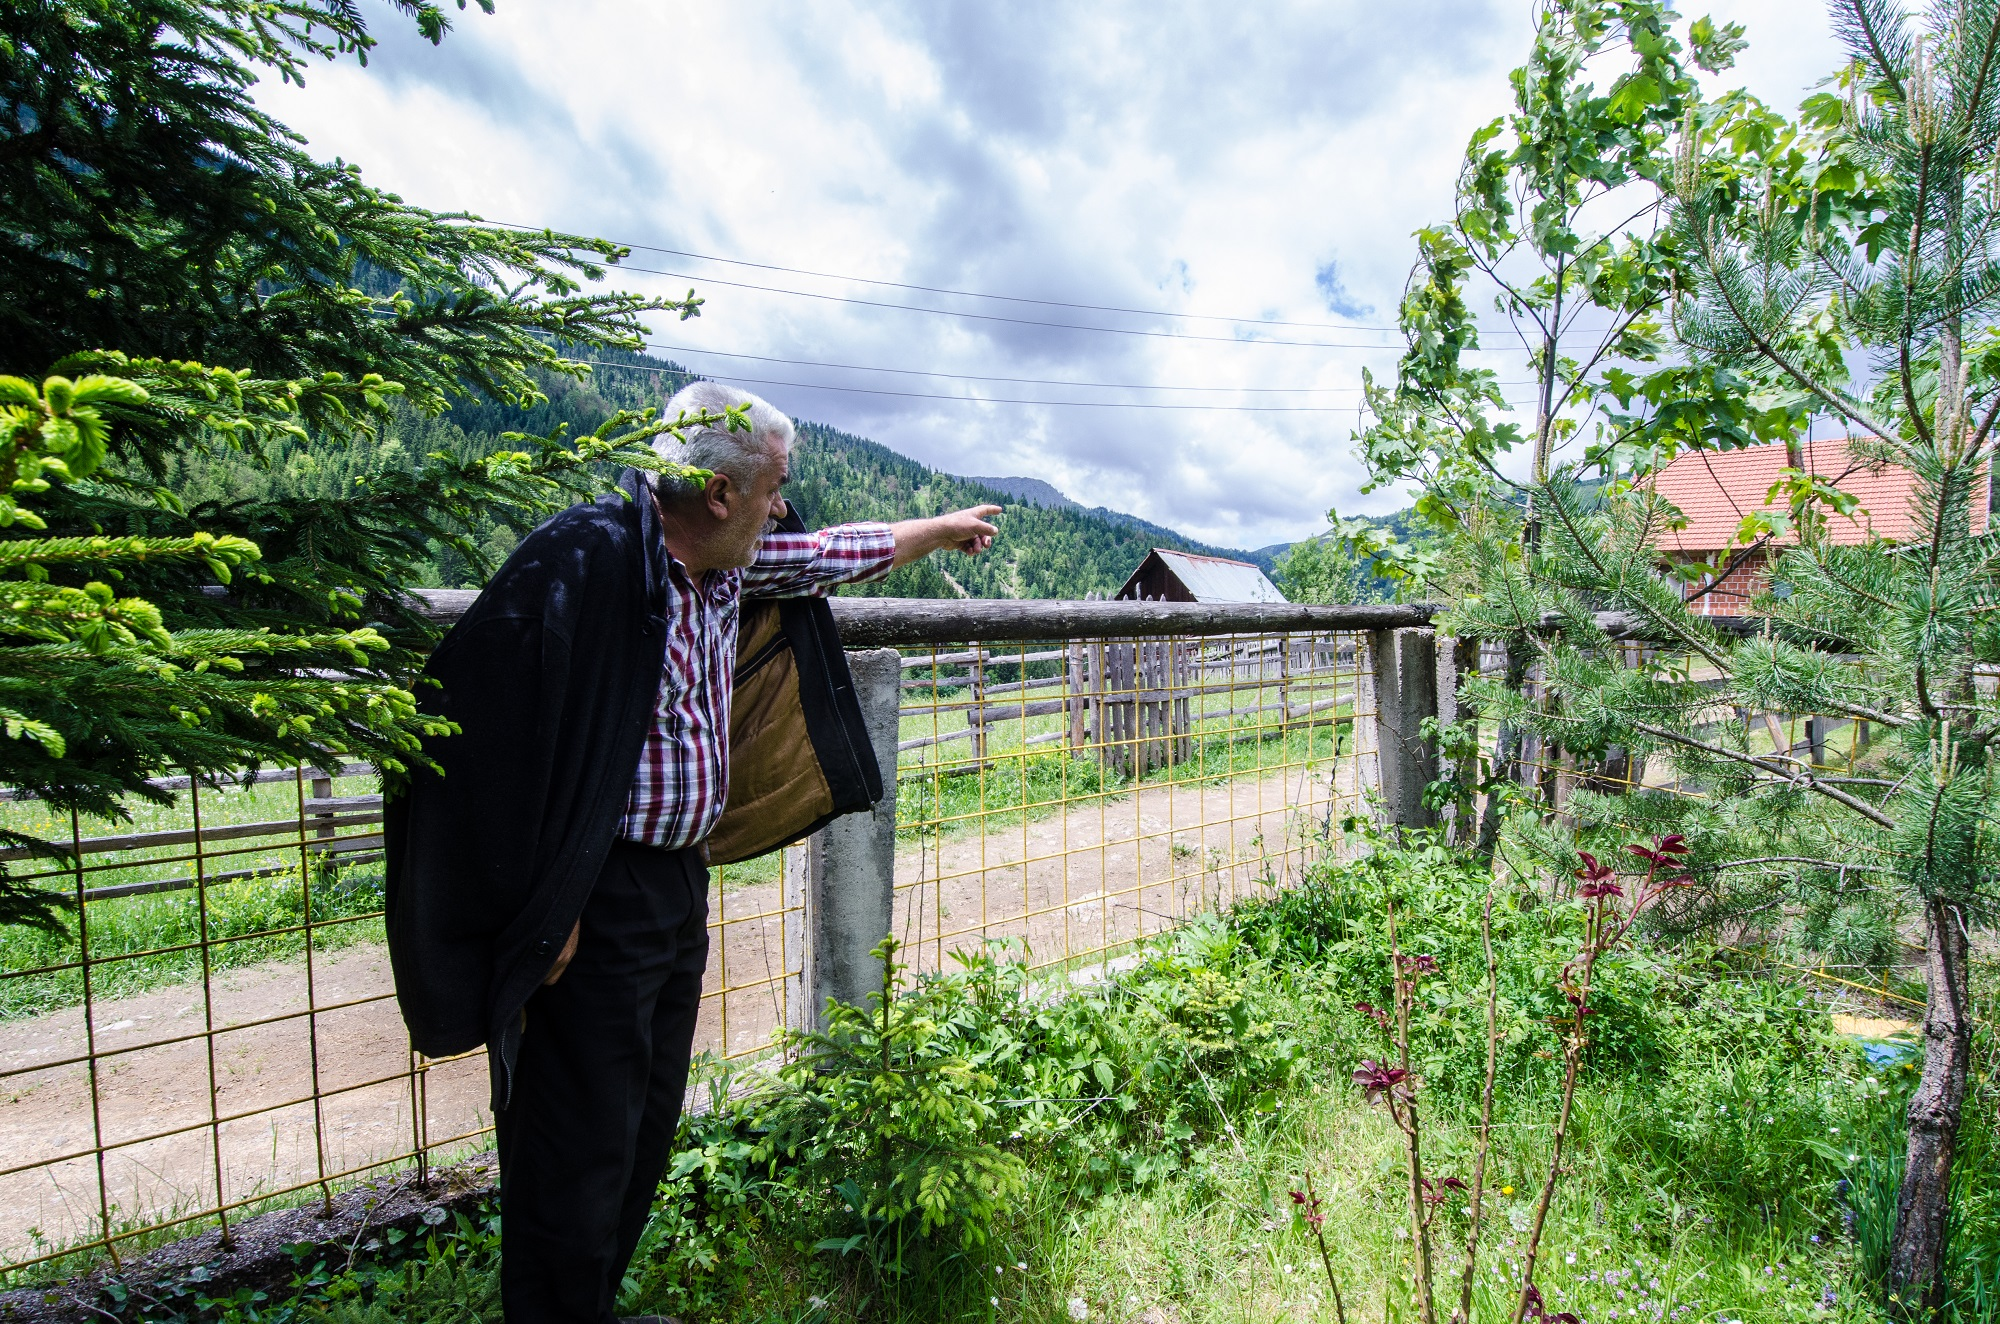 Ali Hajdaraj, a Rugova highlander from Haxhaj village, points towards where the new border will be with Montenegro. Photo: Valerie Plesch.